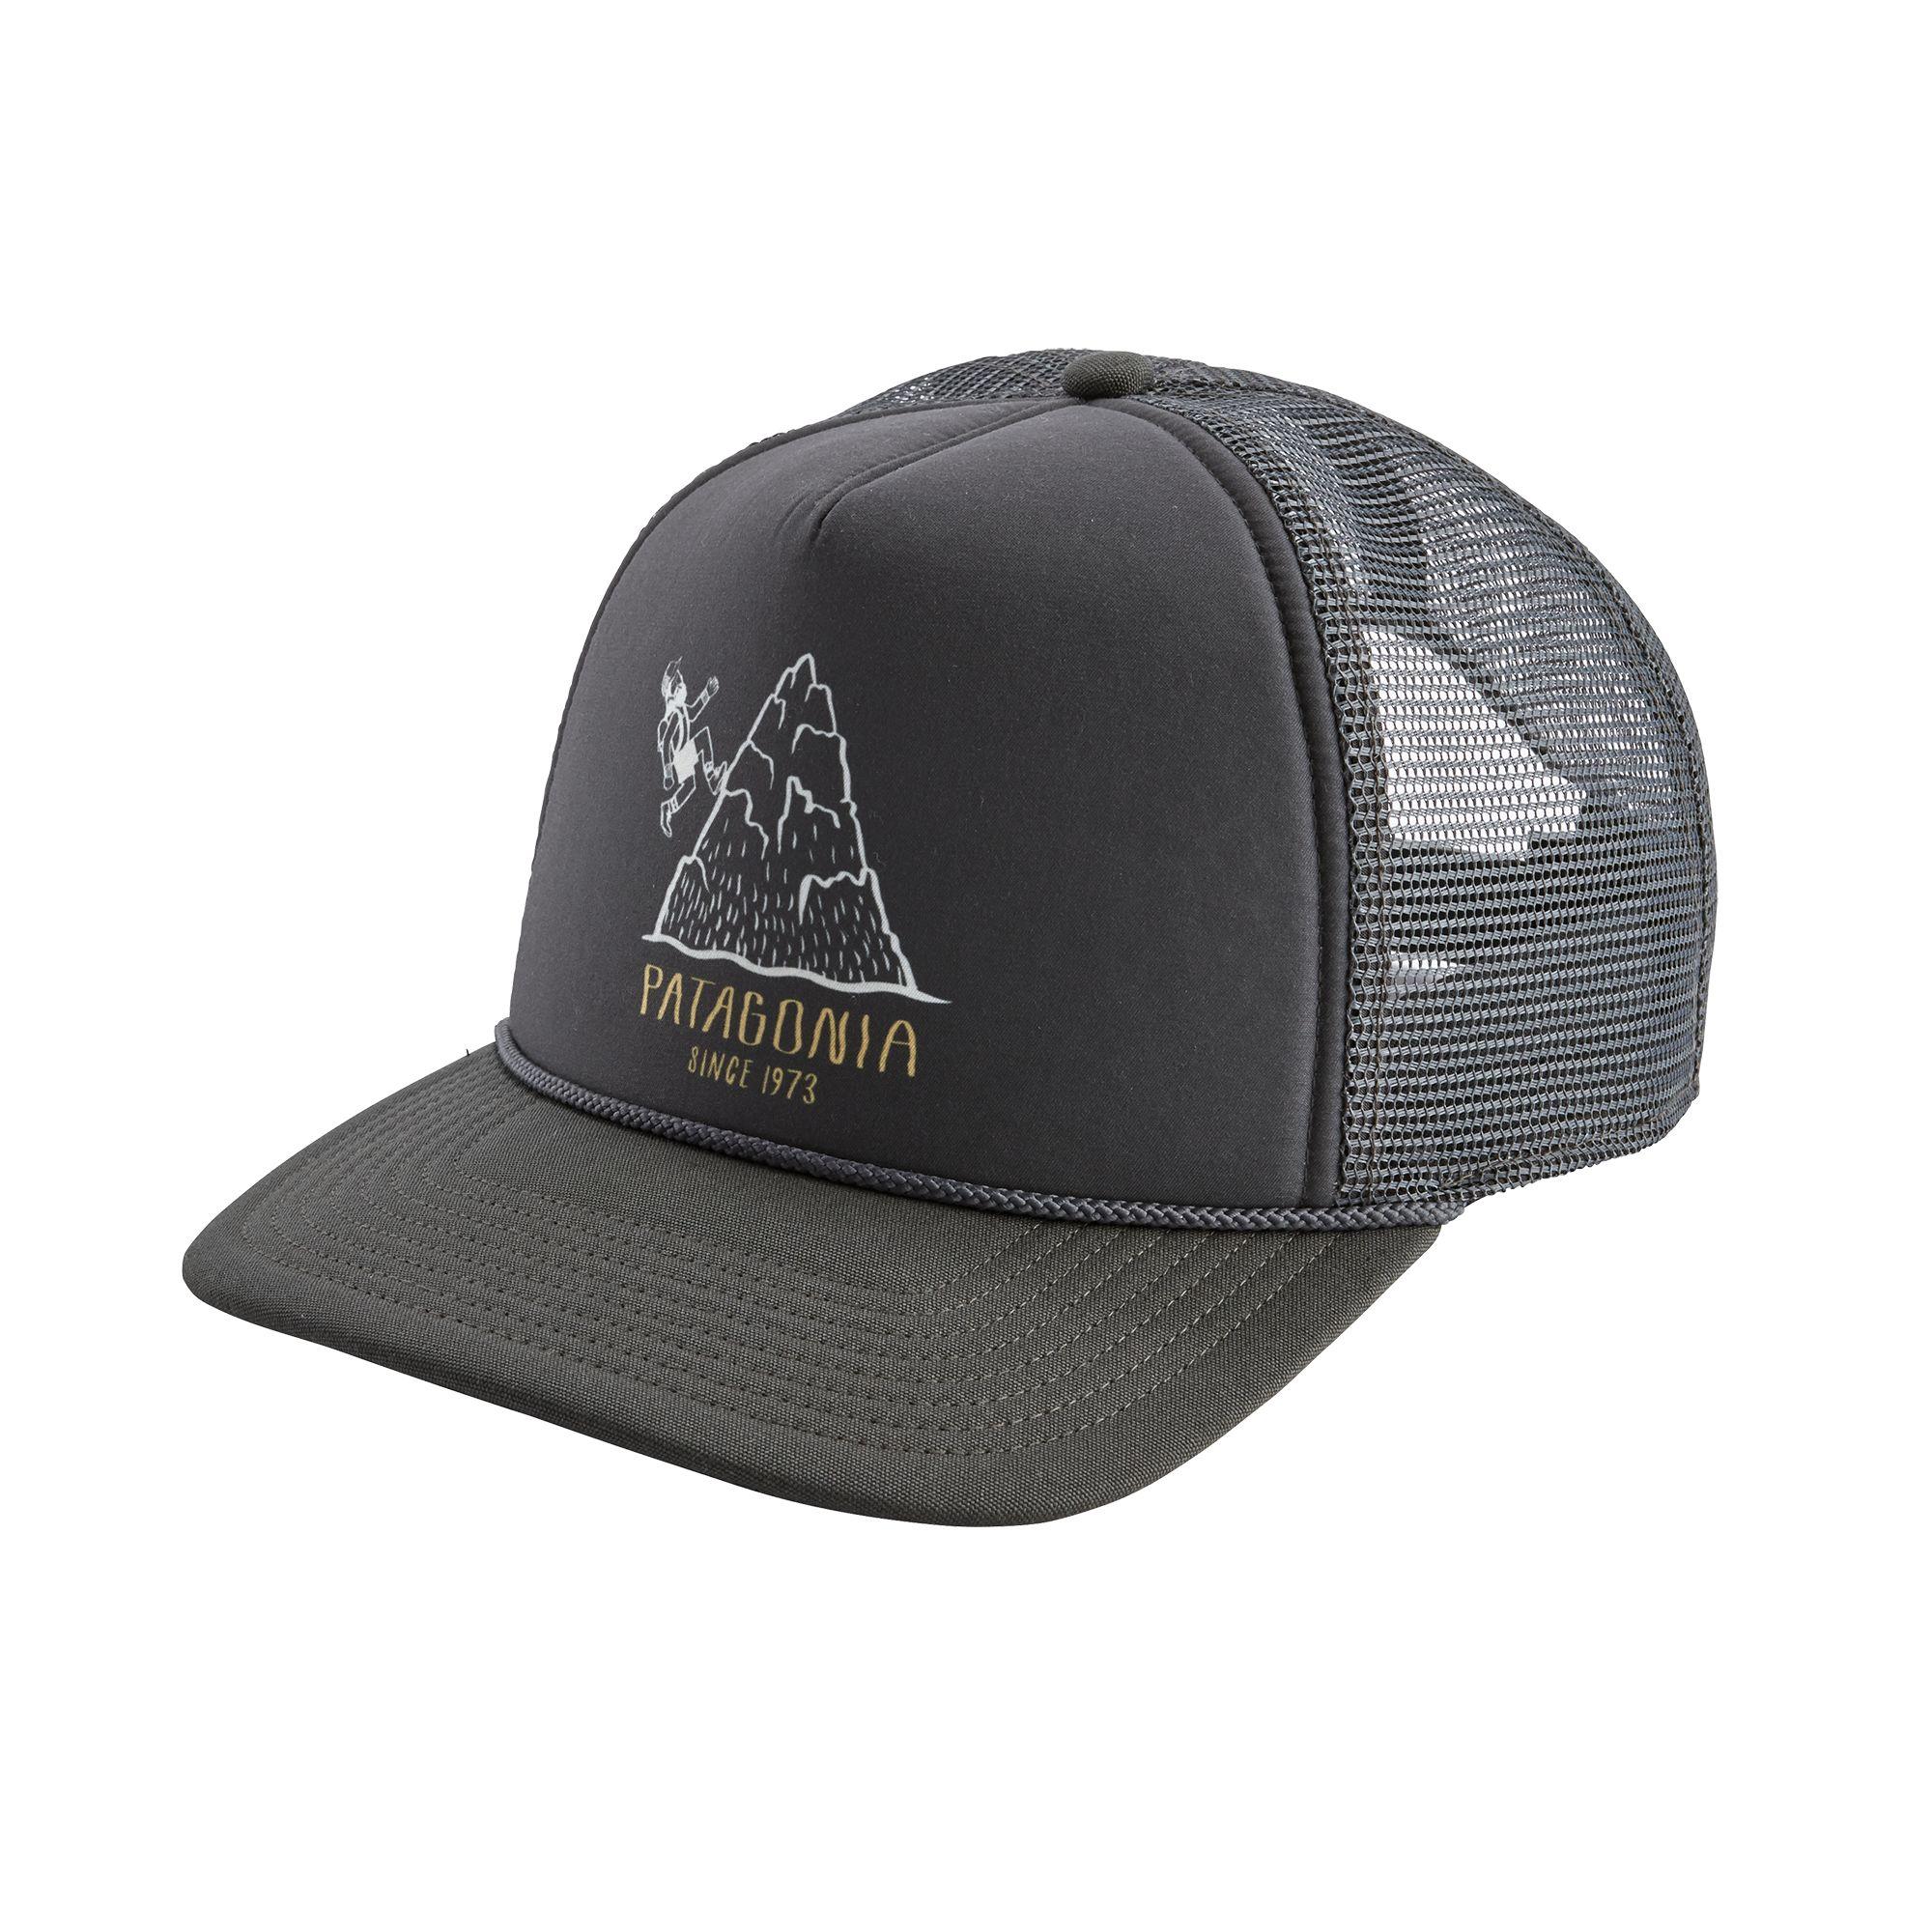 Patagonia Hoofin It Interstate Hat